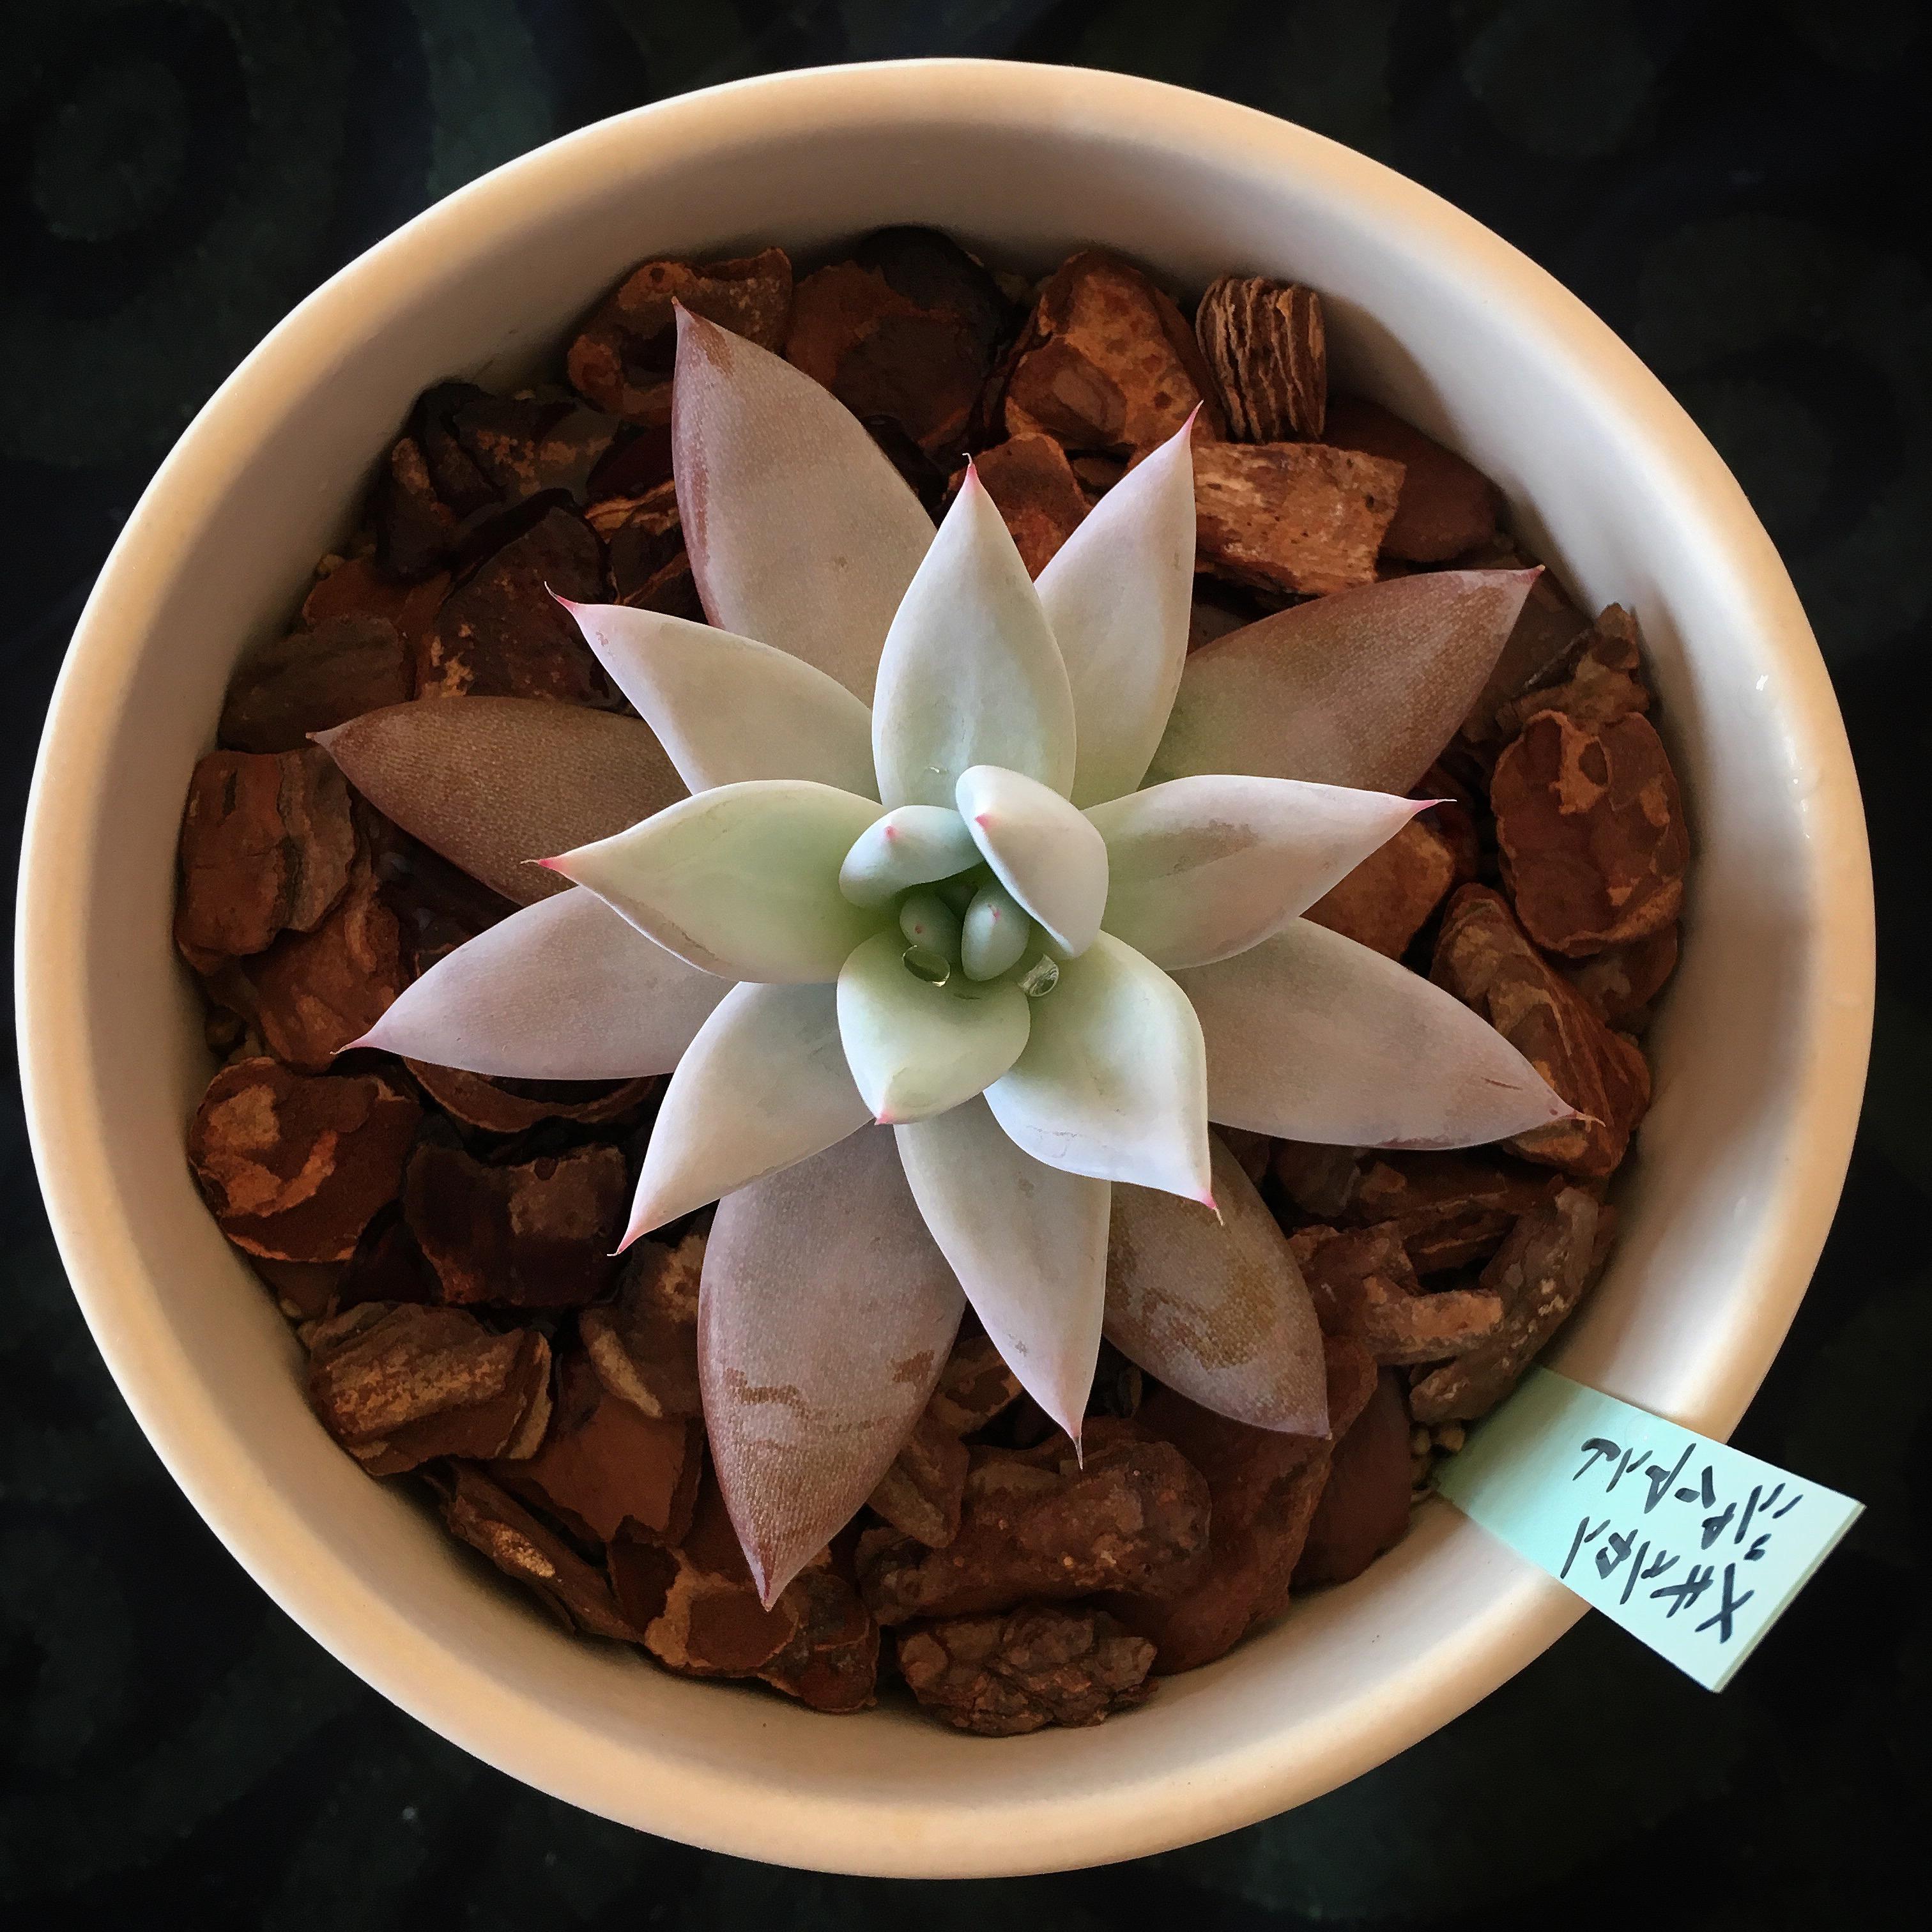 UKI-taniku 植物観察日誌。